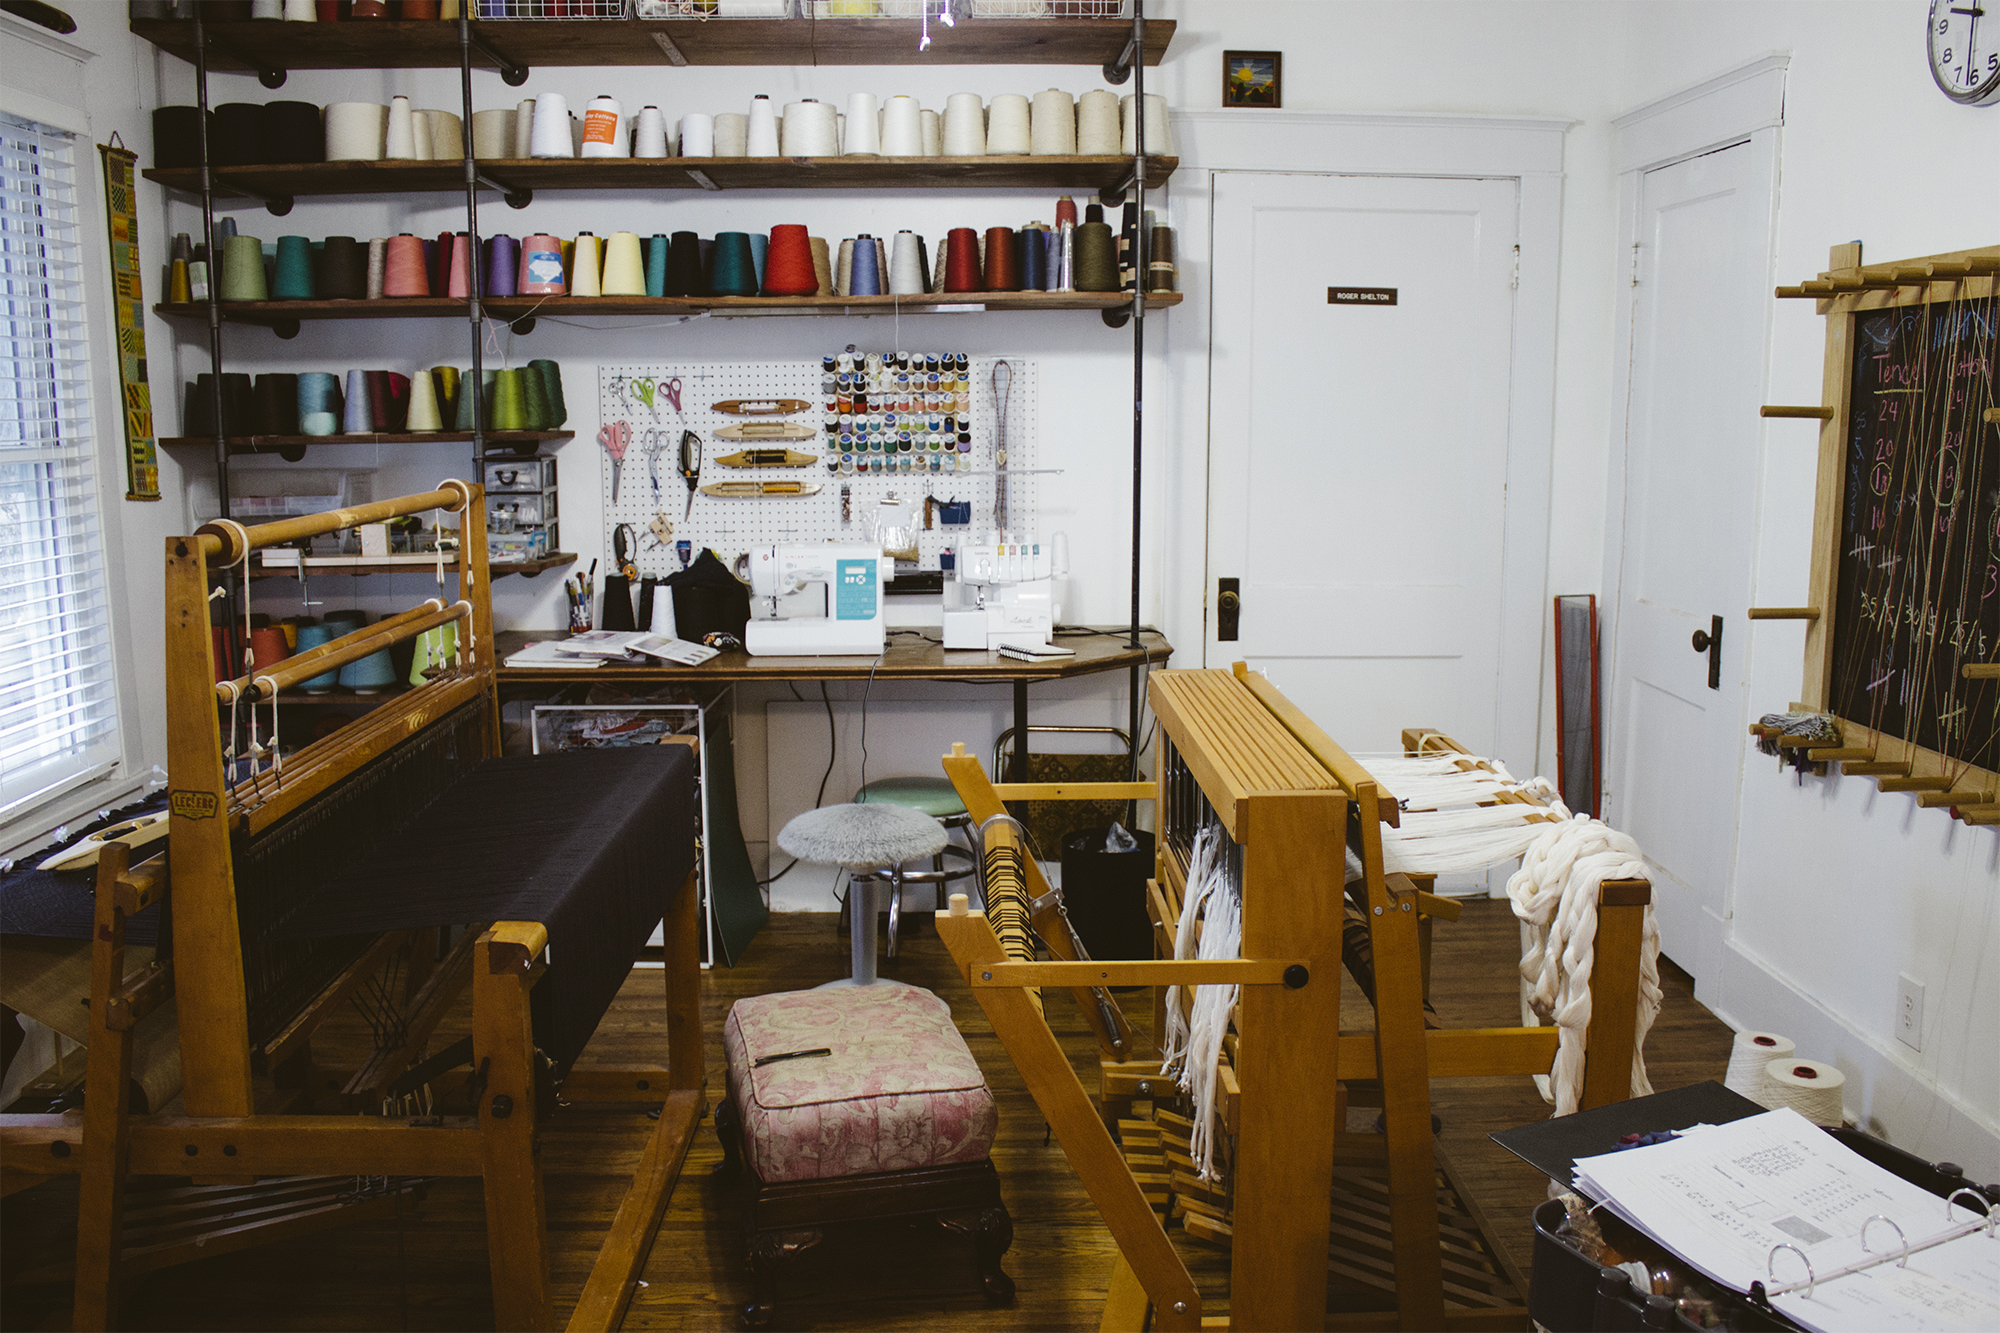 My original home studio in Nashville